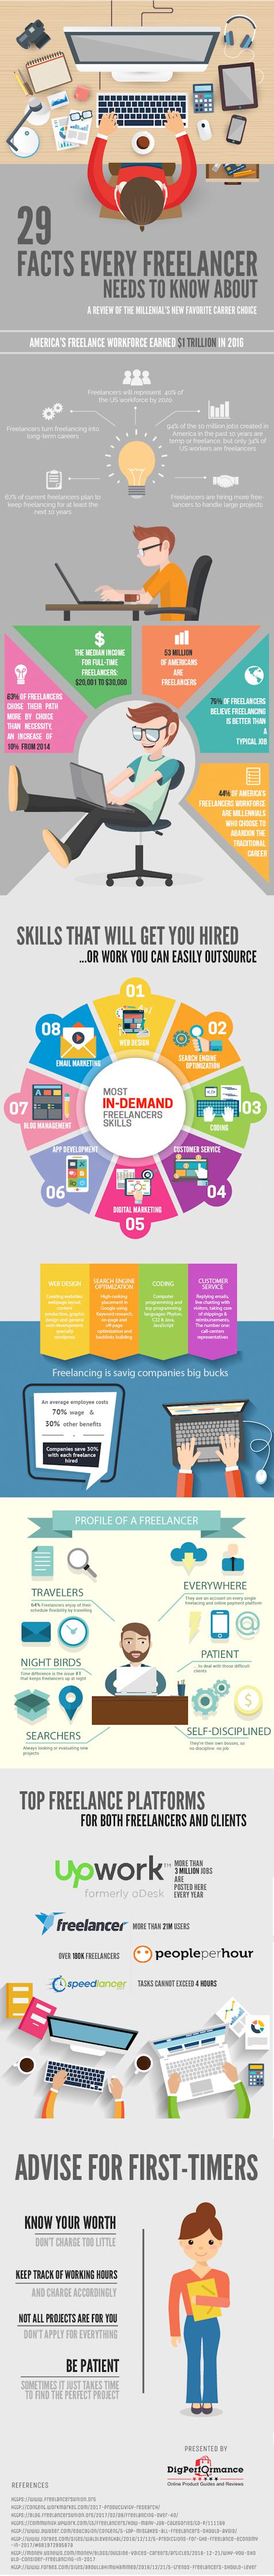 information on freelancing